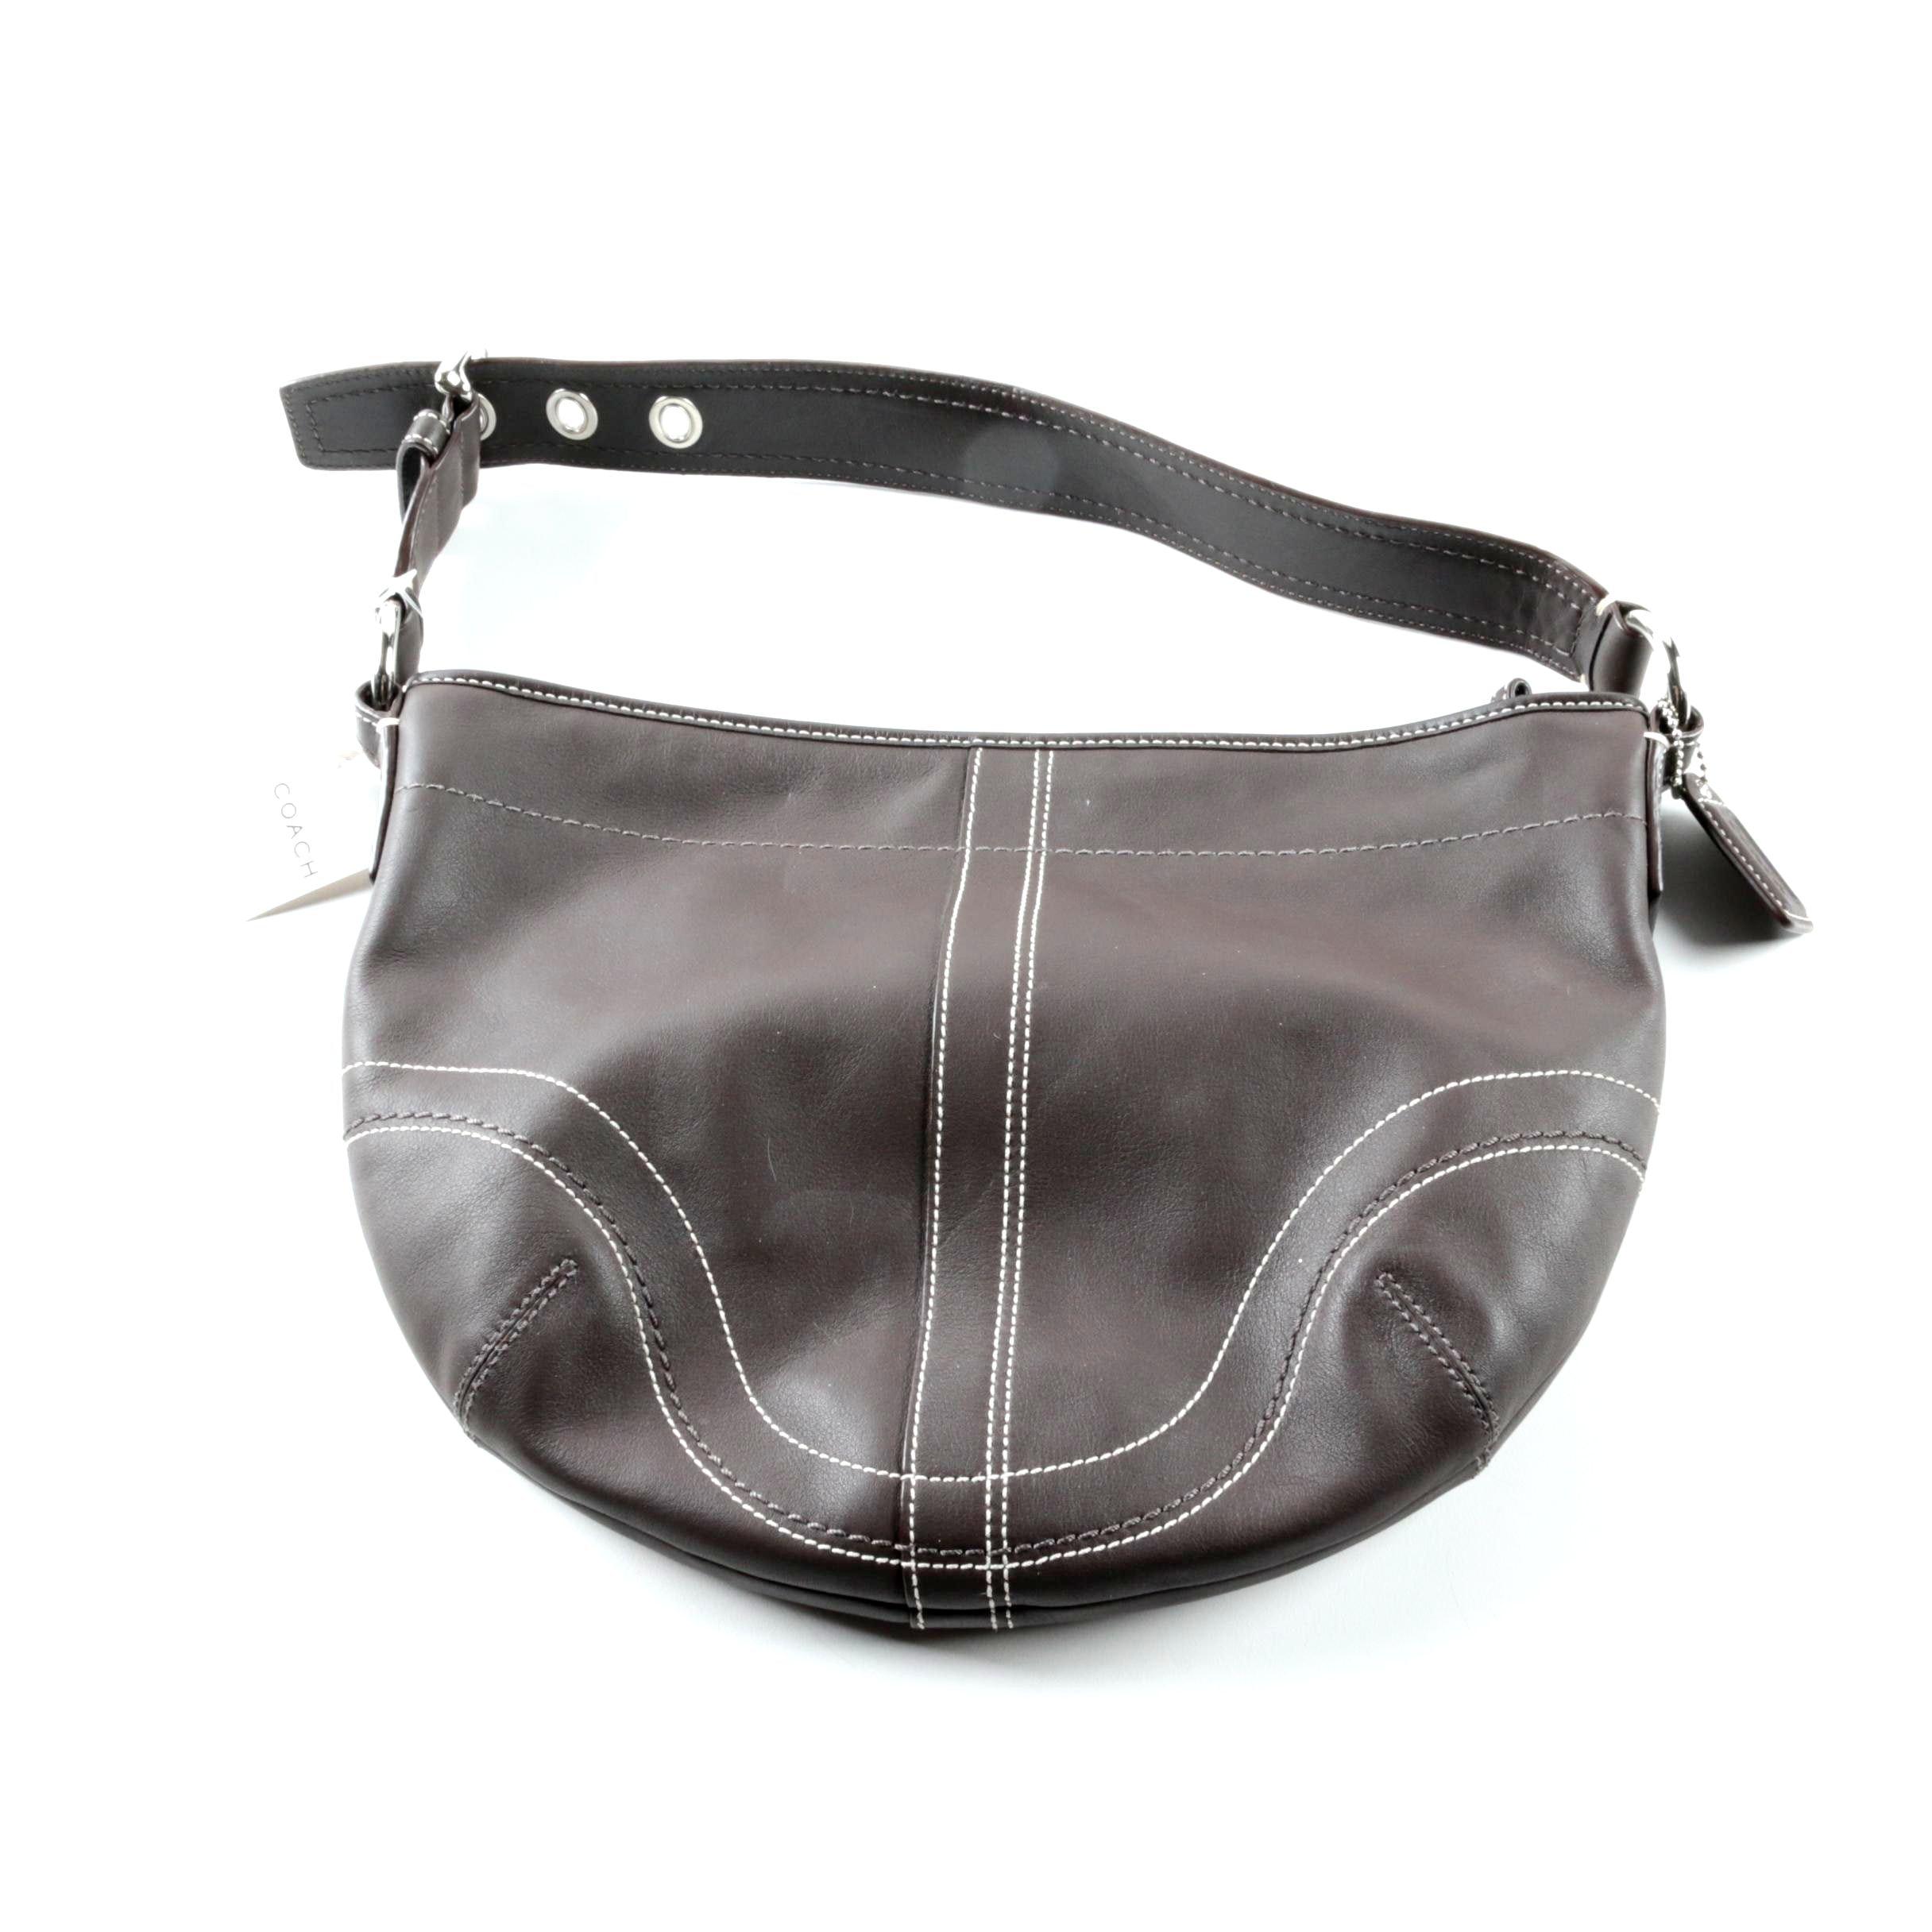 Coach Soho Brown Leather Hobo Bag